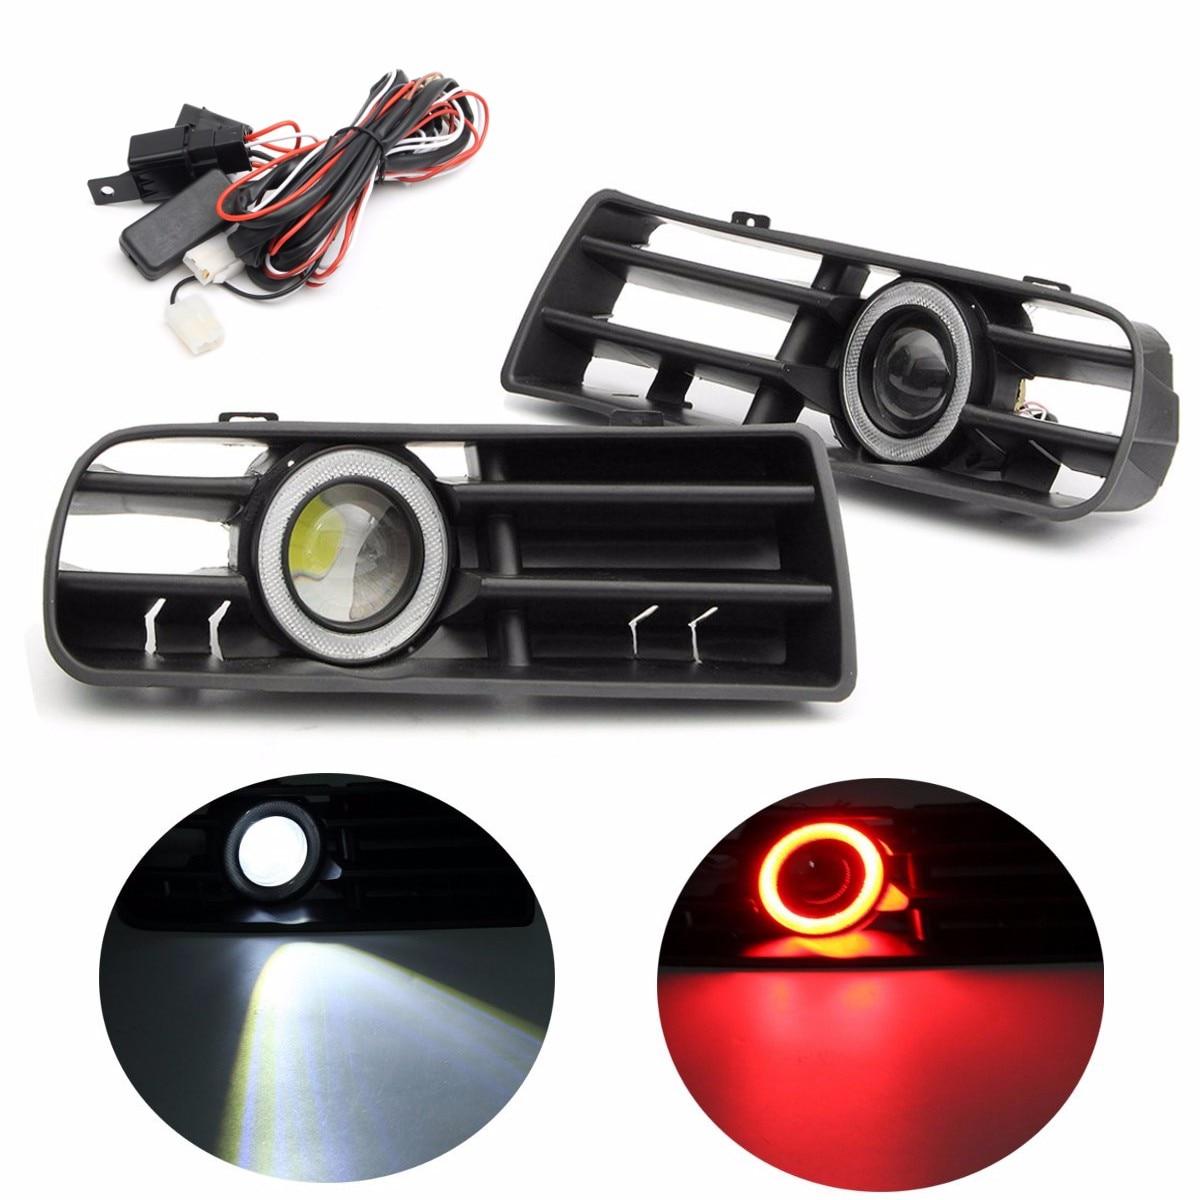 1 Pair(2Pcs) LED Fog Light Lamp Front Bumper Grille For VW Golf MK4 98-04 Angel Eyes Lamp Waterproof<br><br>Aliexpress